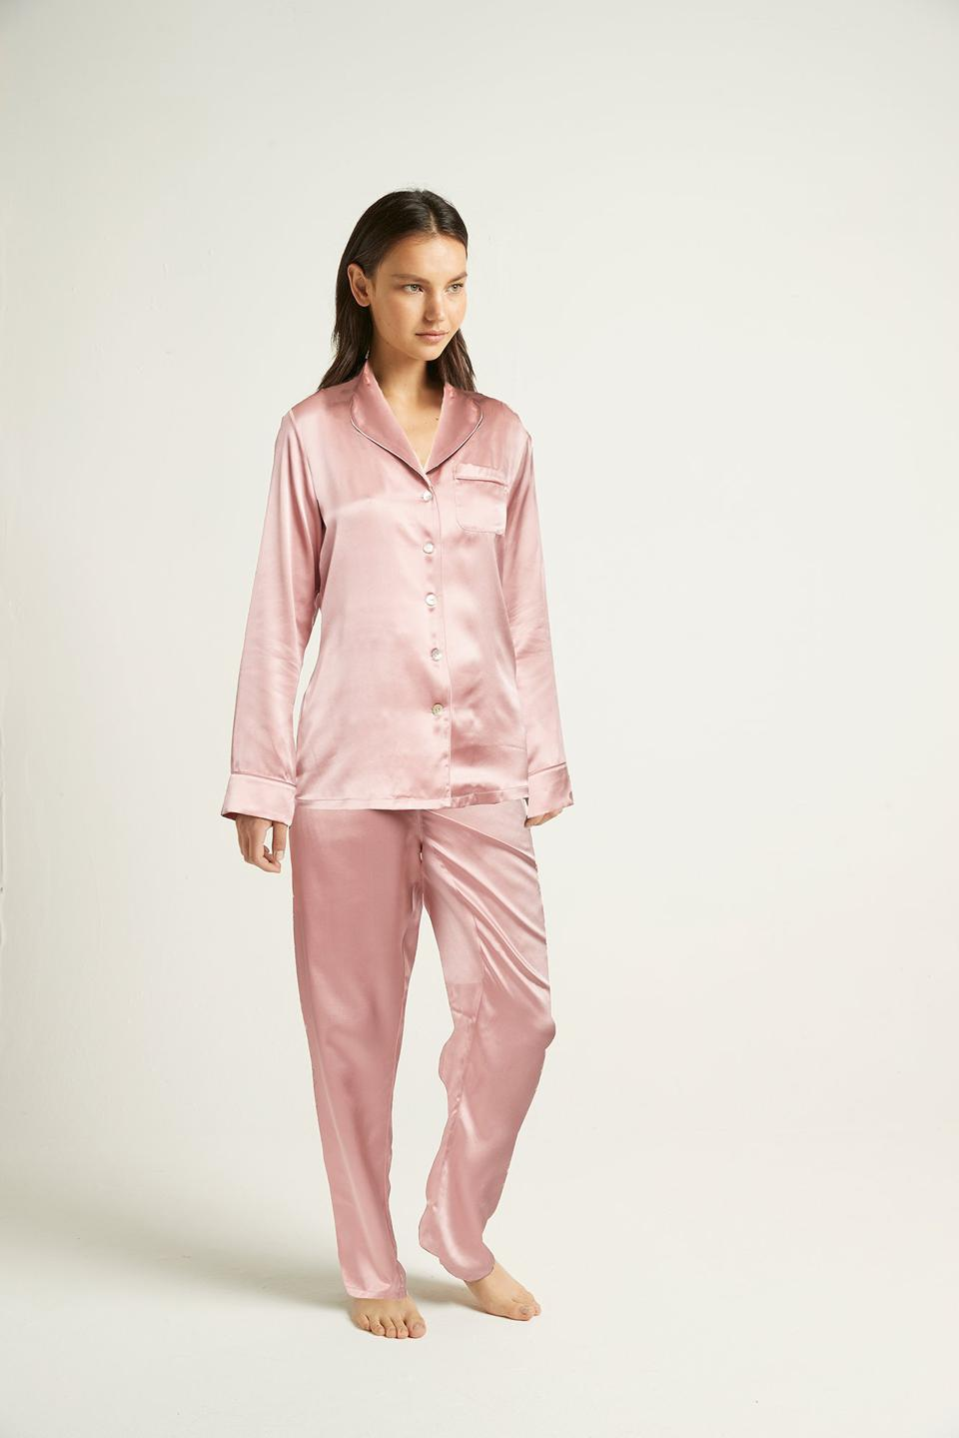 The Ginia silk pajamas in Canyon Rose.